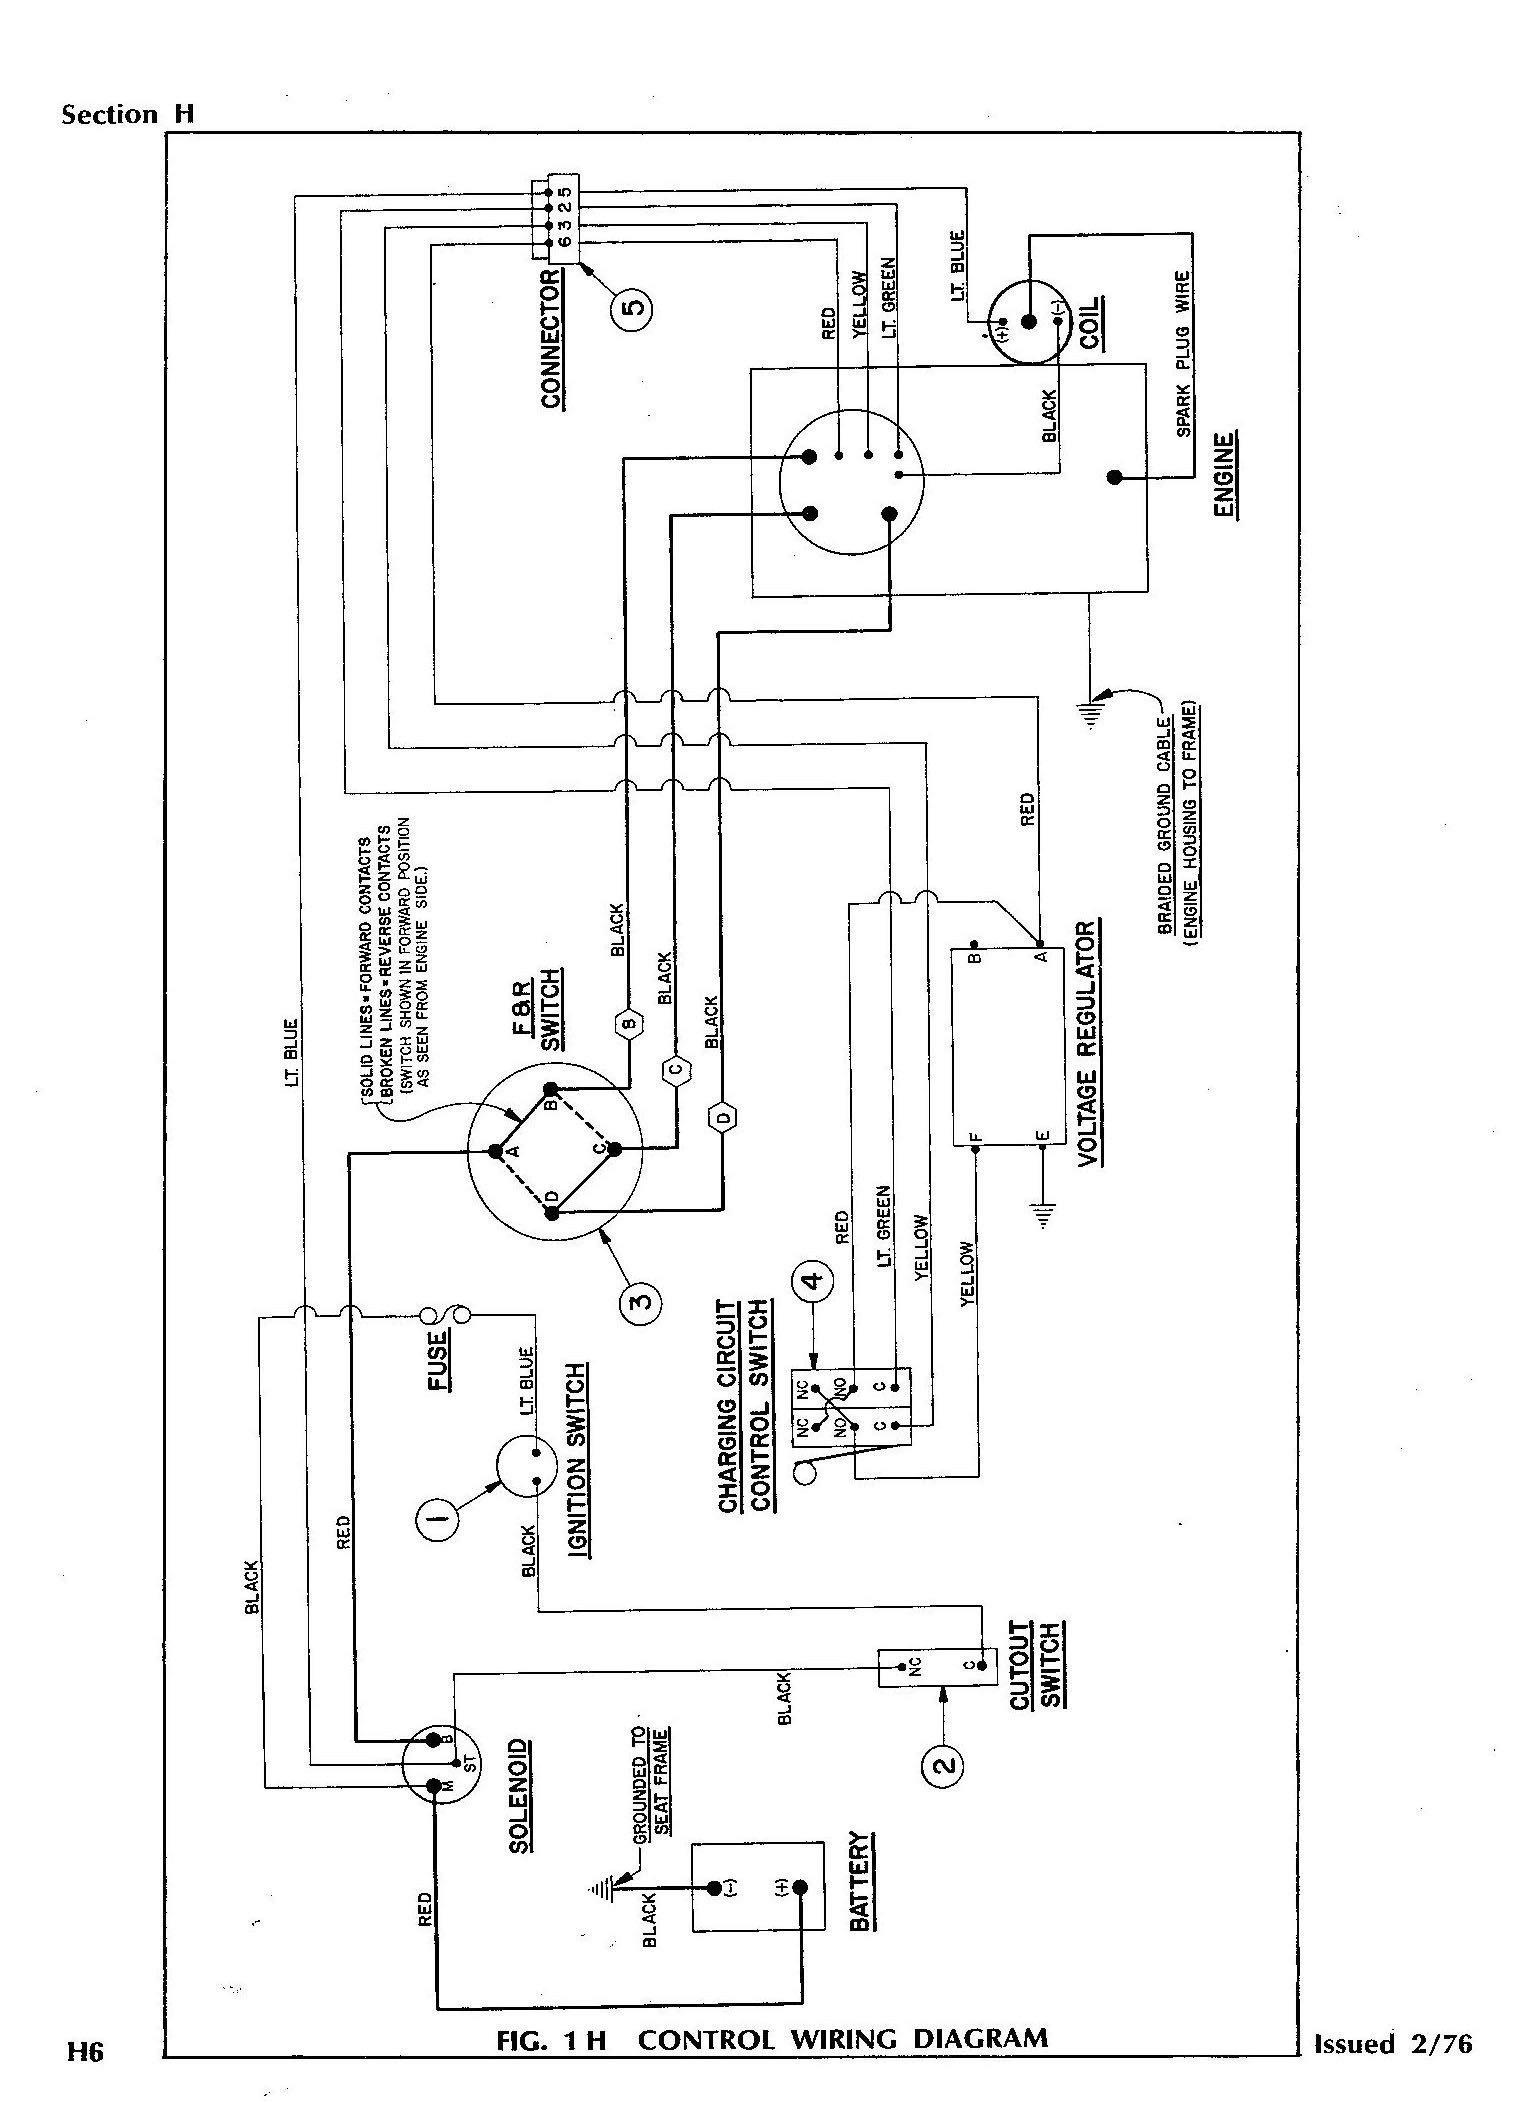 98 ez go gas wiring diagram wiring diagram